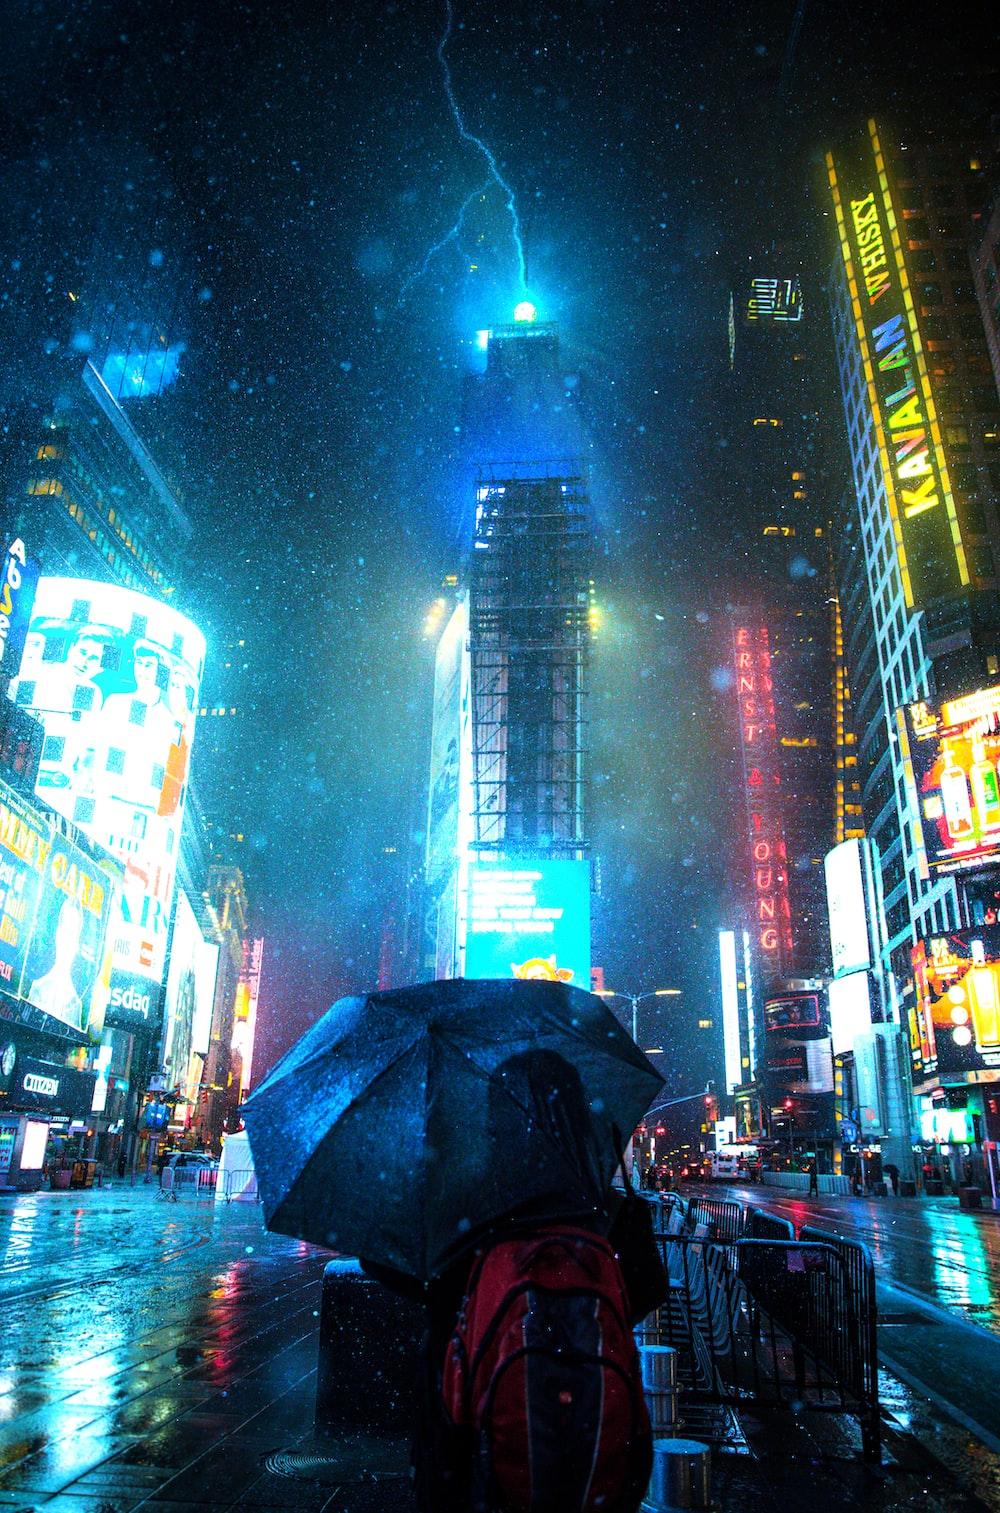 woman carrying umbrella